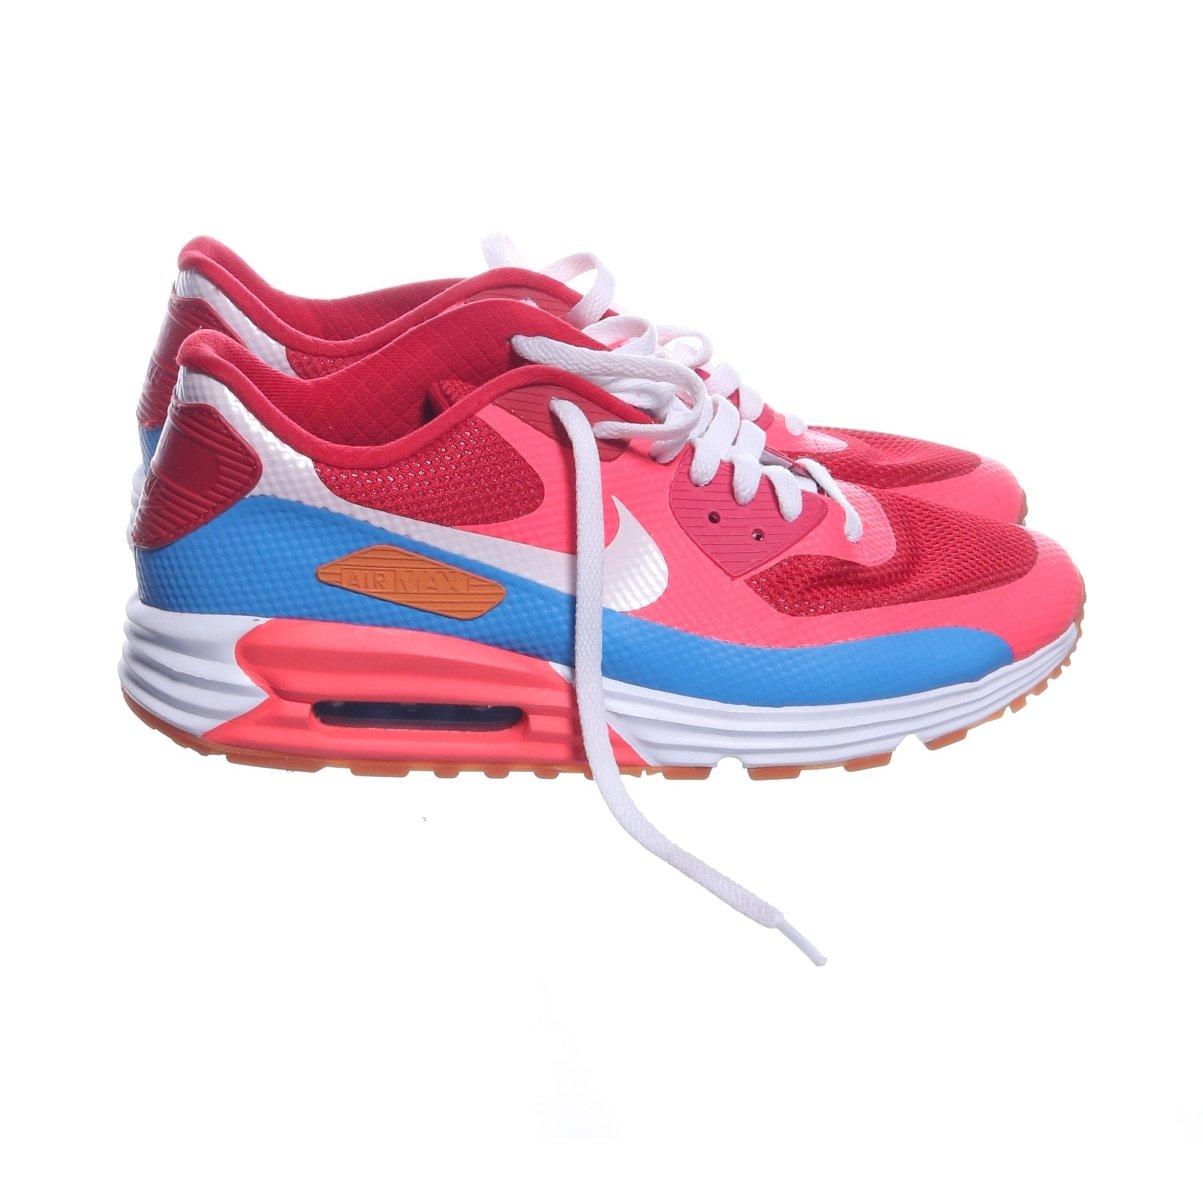 premium selection 2bcd4 c4a14 Nike ID, Sneakers, Strl  42,5, Air Max Hyperfuse, Flerfärgad